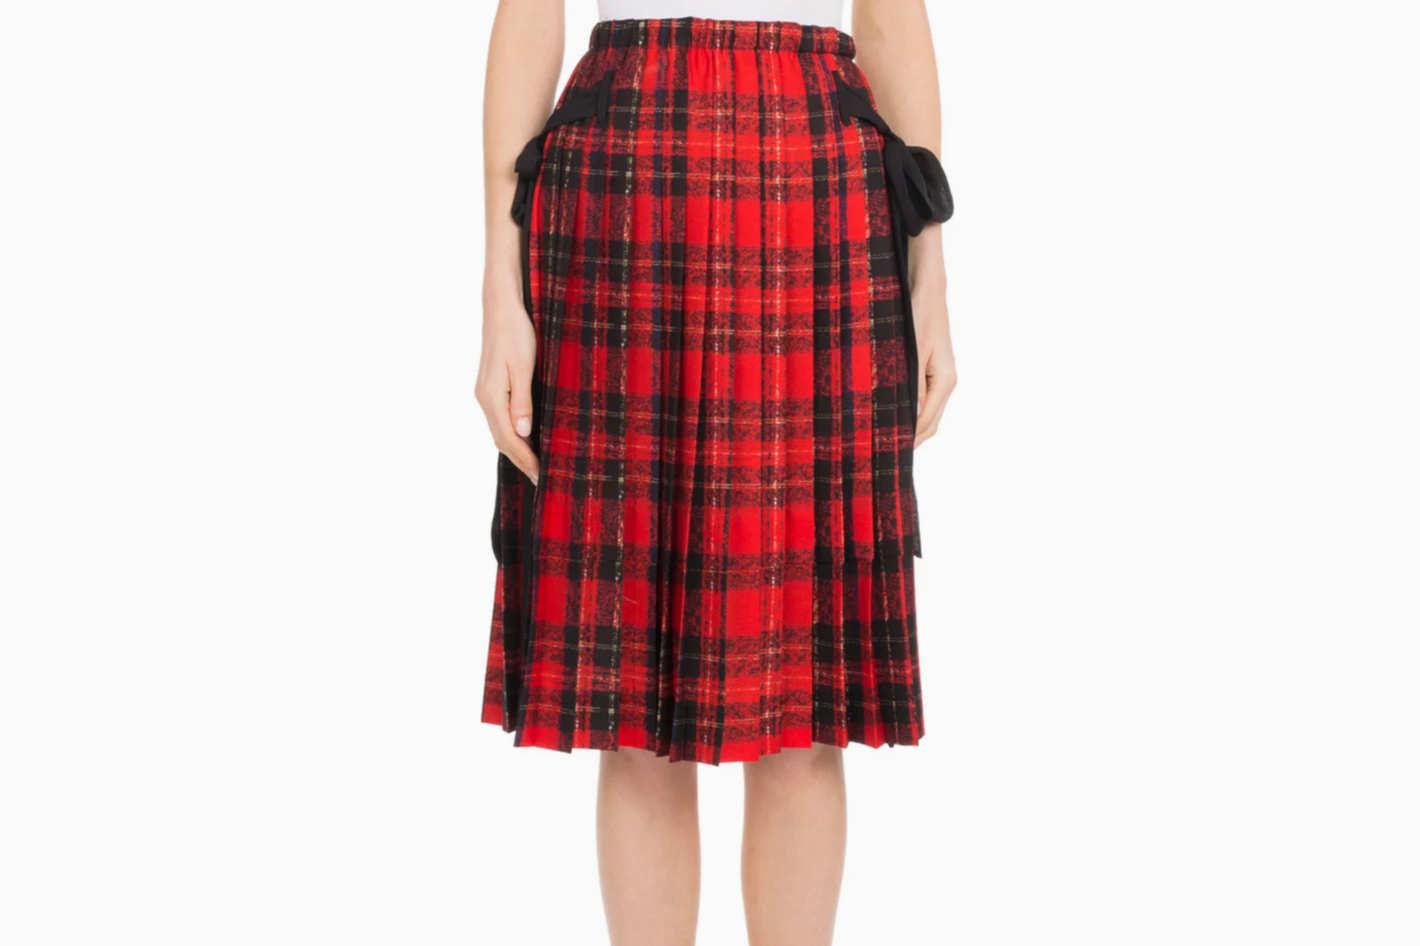 5ef45e0d47 Simone Rocha Pleated Plaid Knee-Length Skirt w  Bow Details